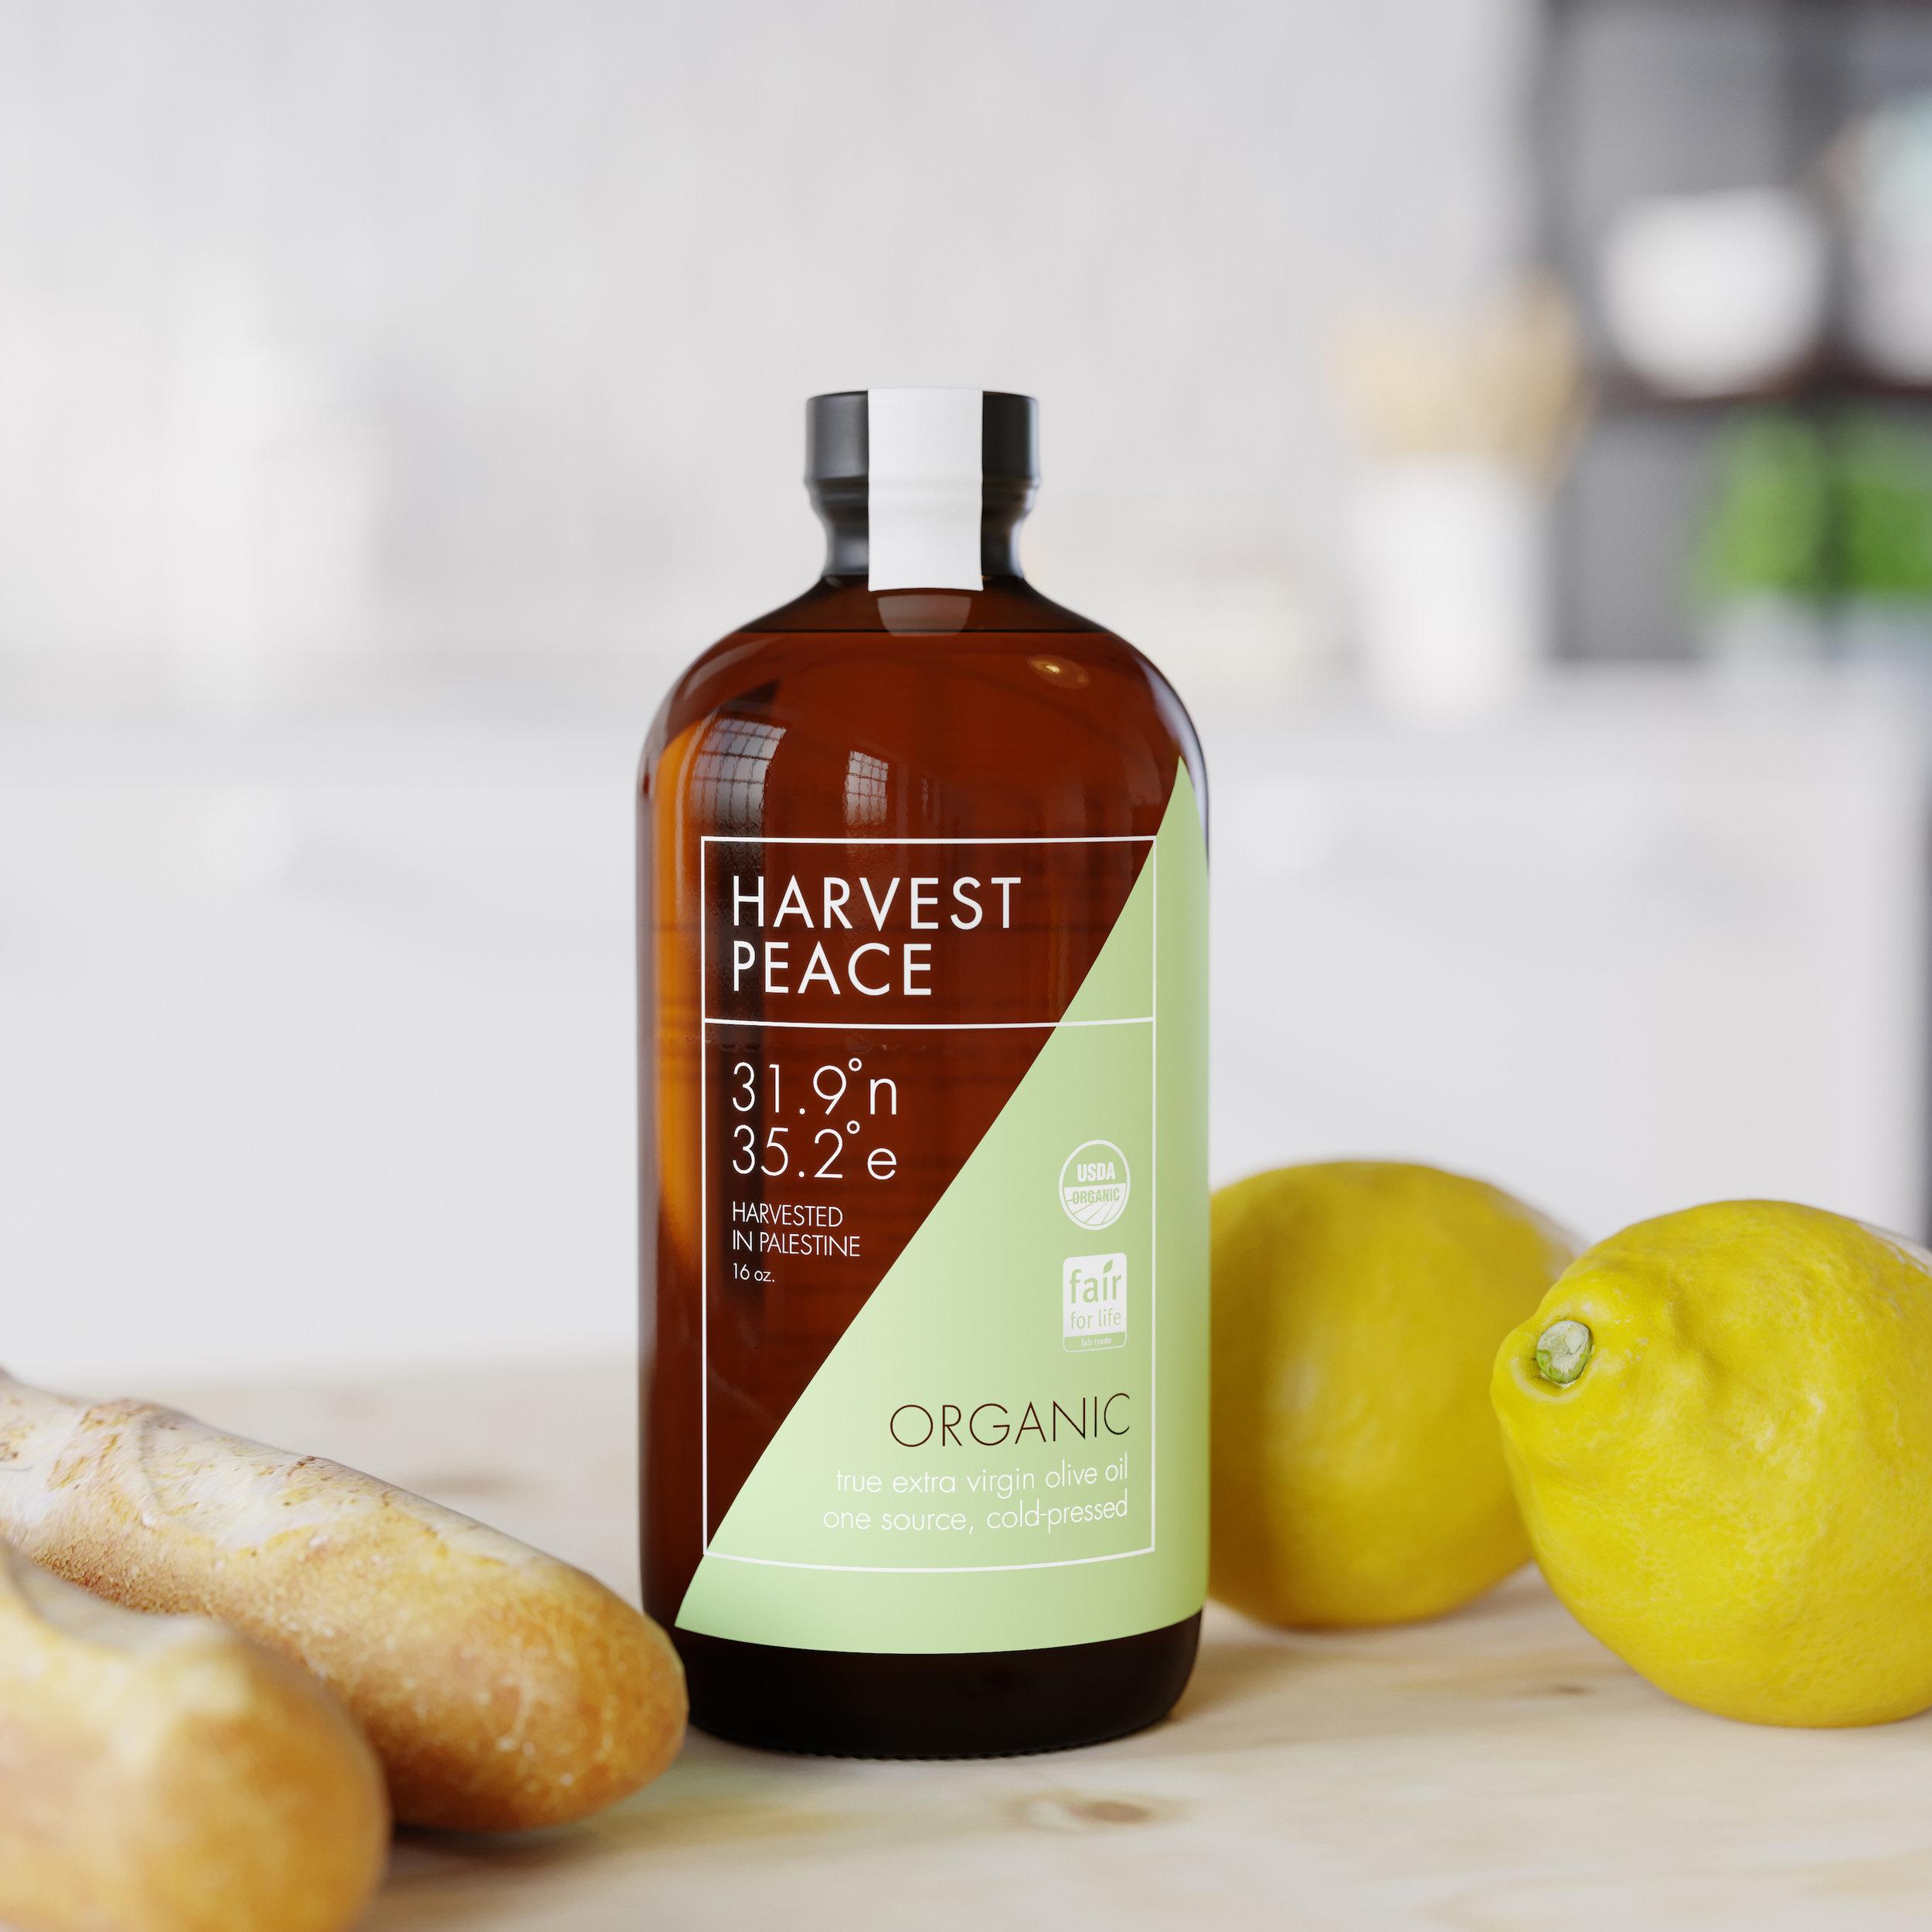 Harvest Bottle in Kitchen.jpg